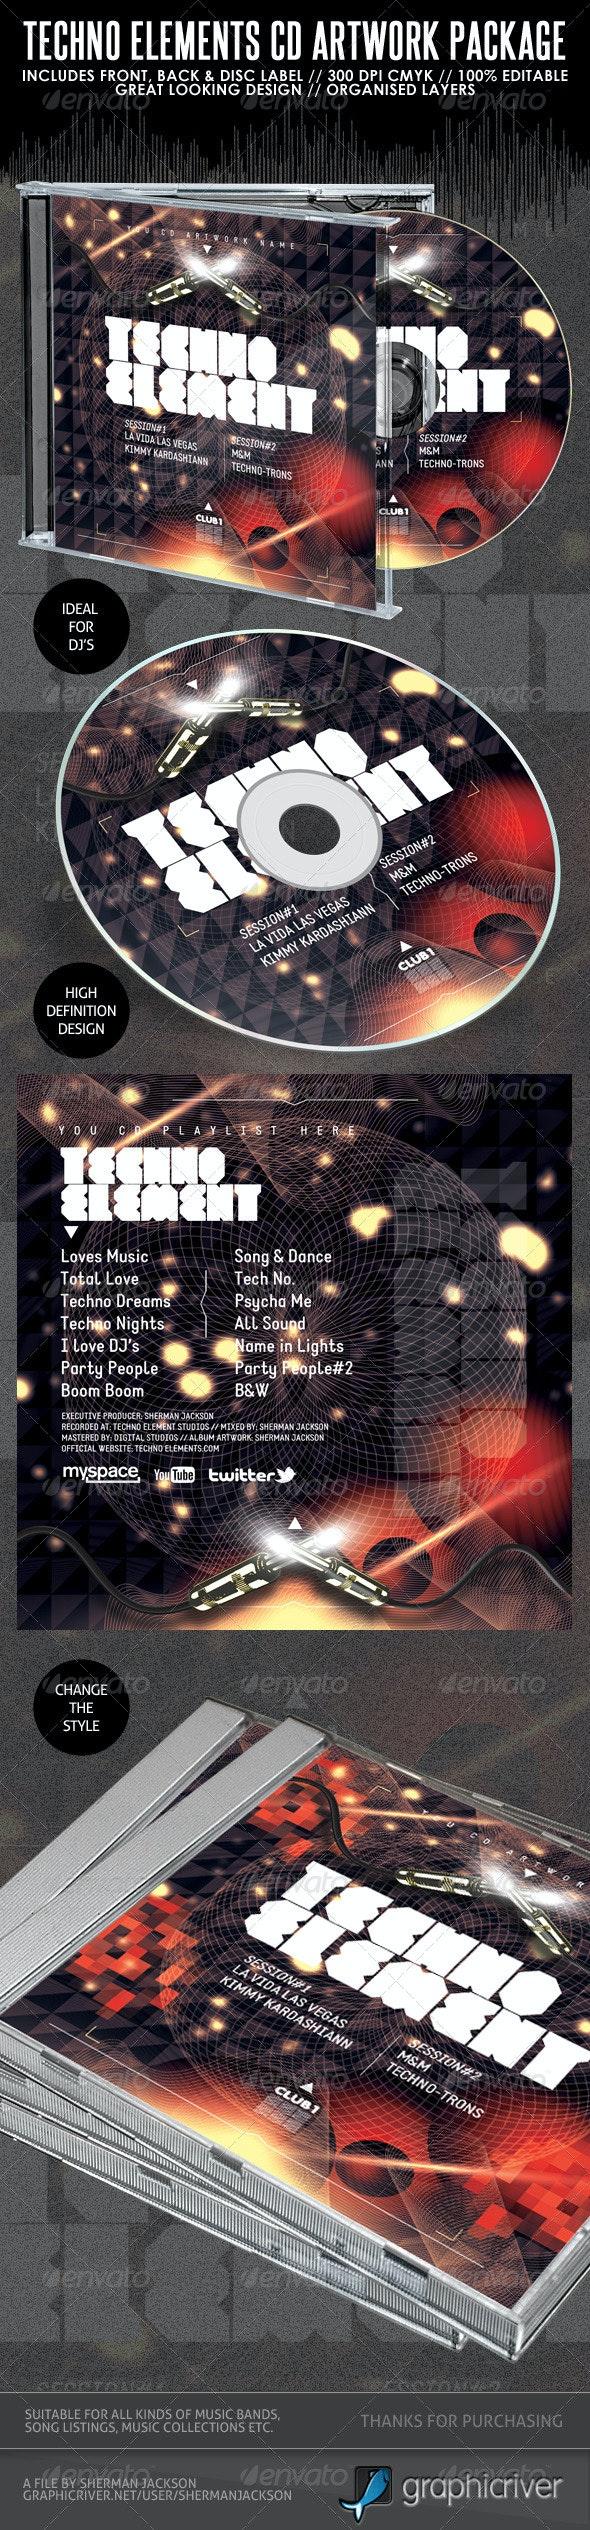 Techno Elements CD Artwork Package - CD & DVD Artwork Print Templates